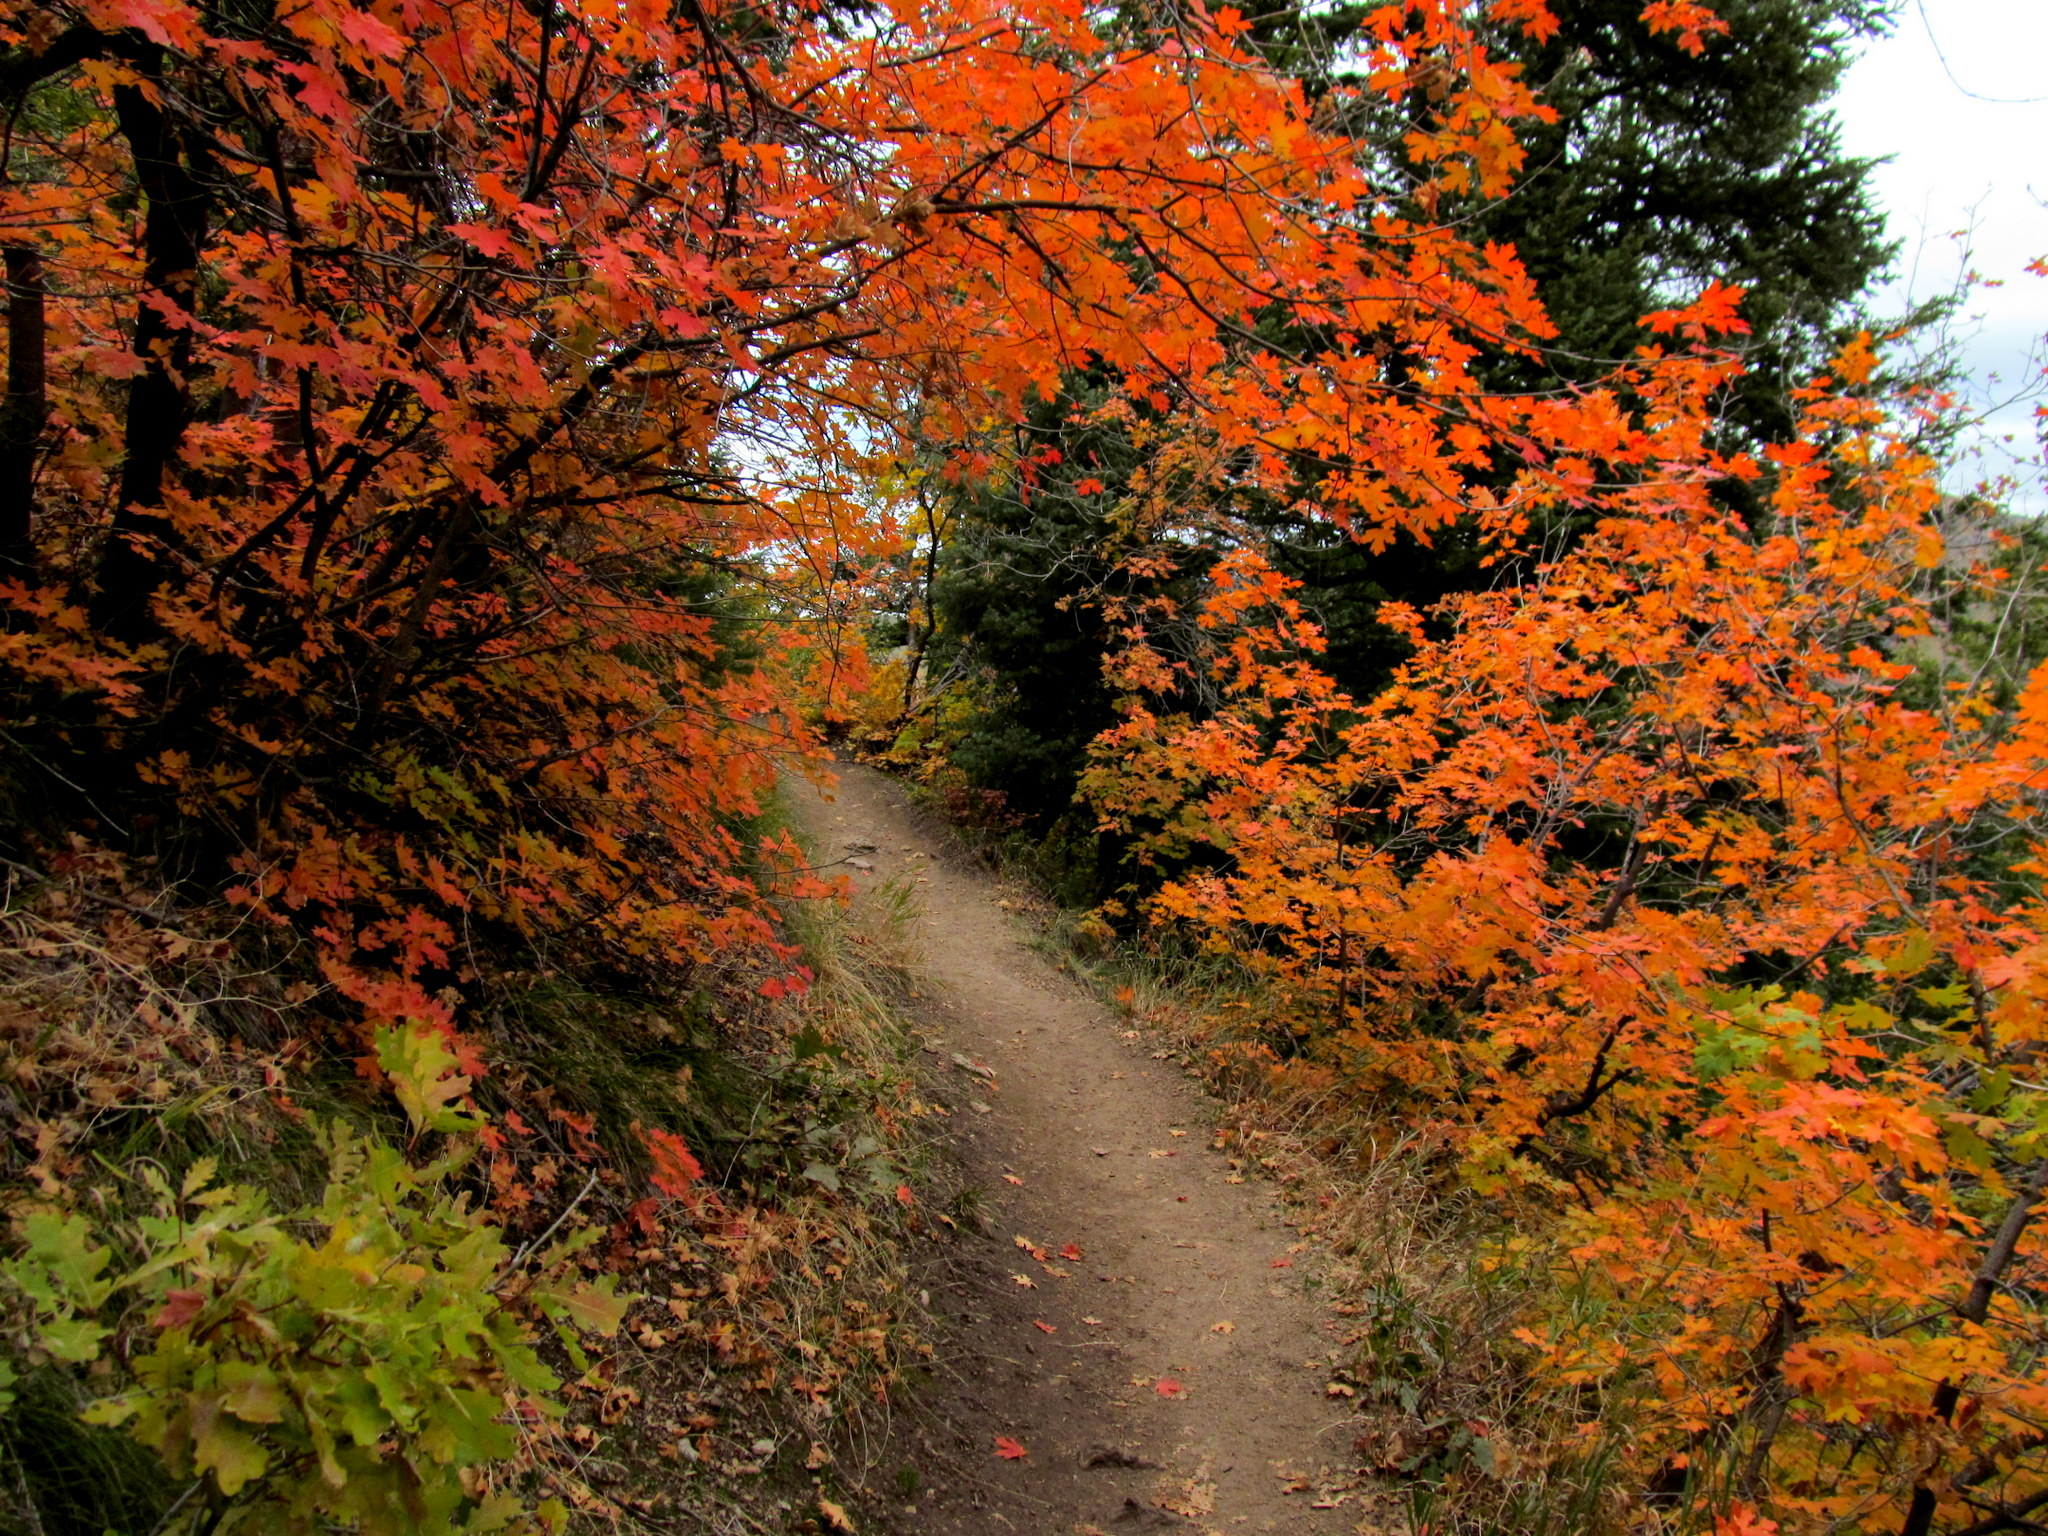 Photo: Desolation Trail